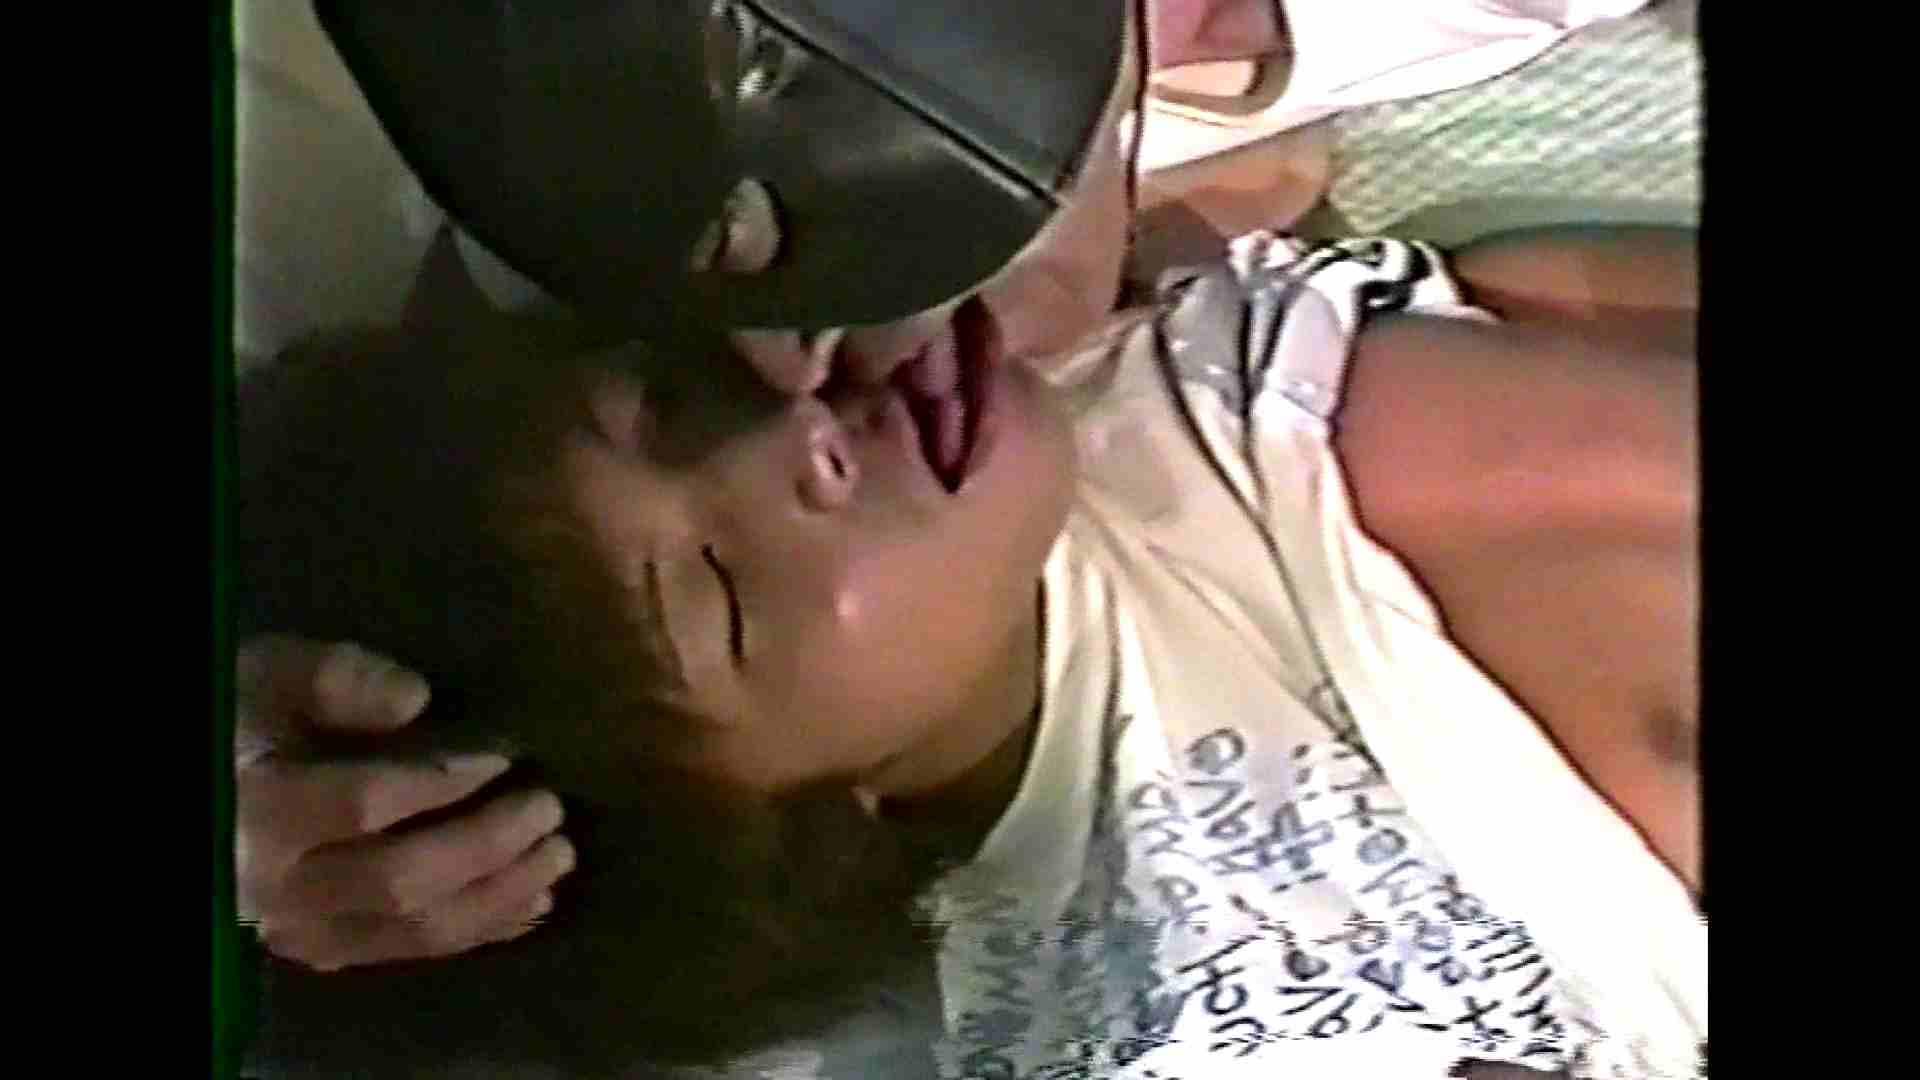 GAYBOY宏のオカズ倉庫Vol.3-1 完全無修正  89pic 23